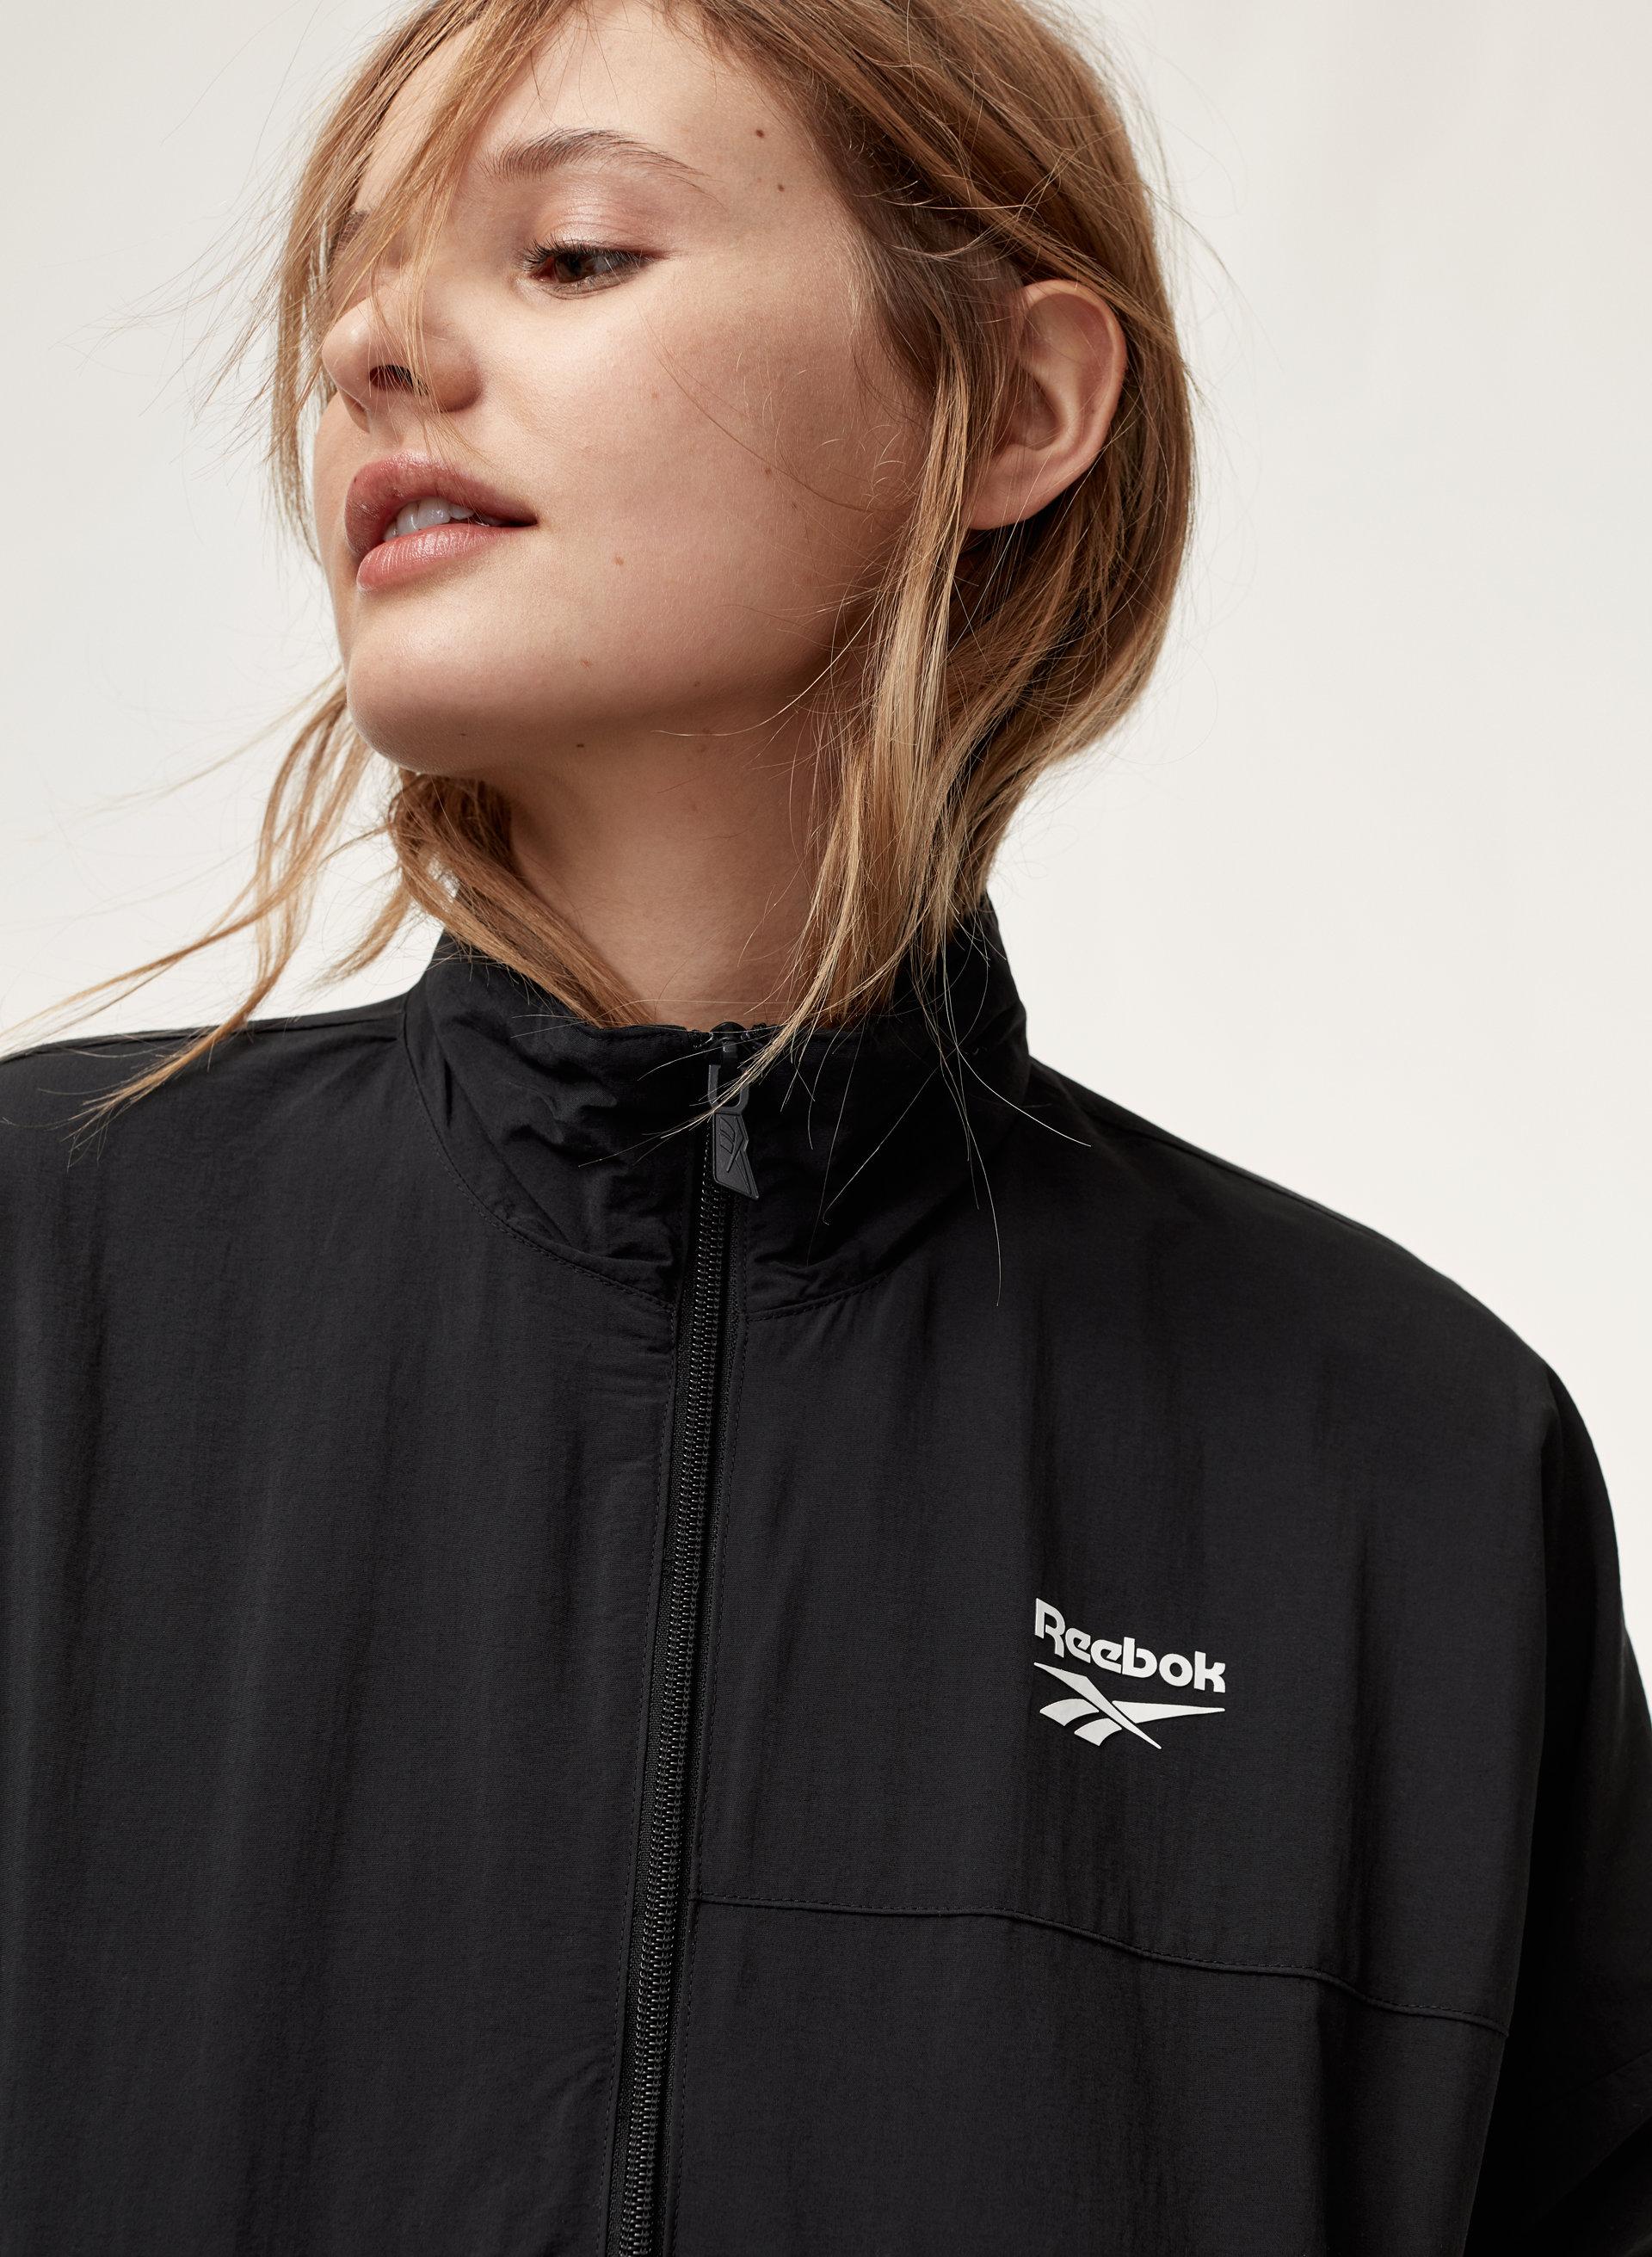 reebok lf track jacket